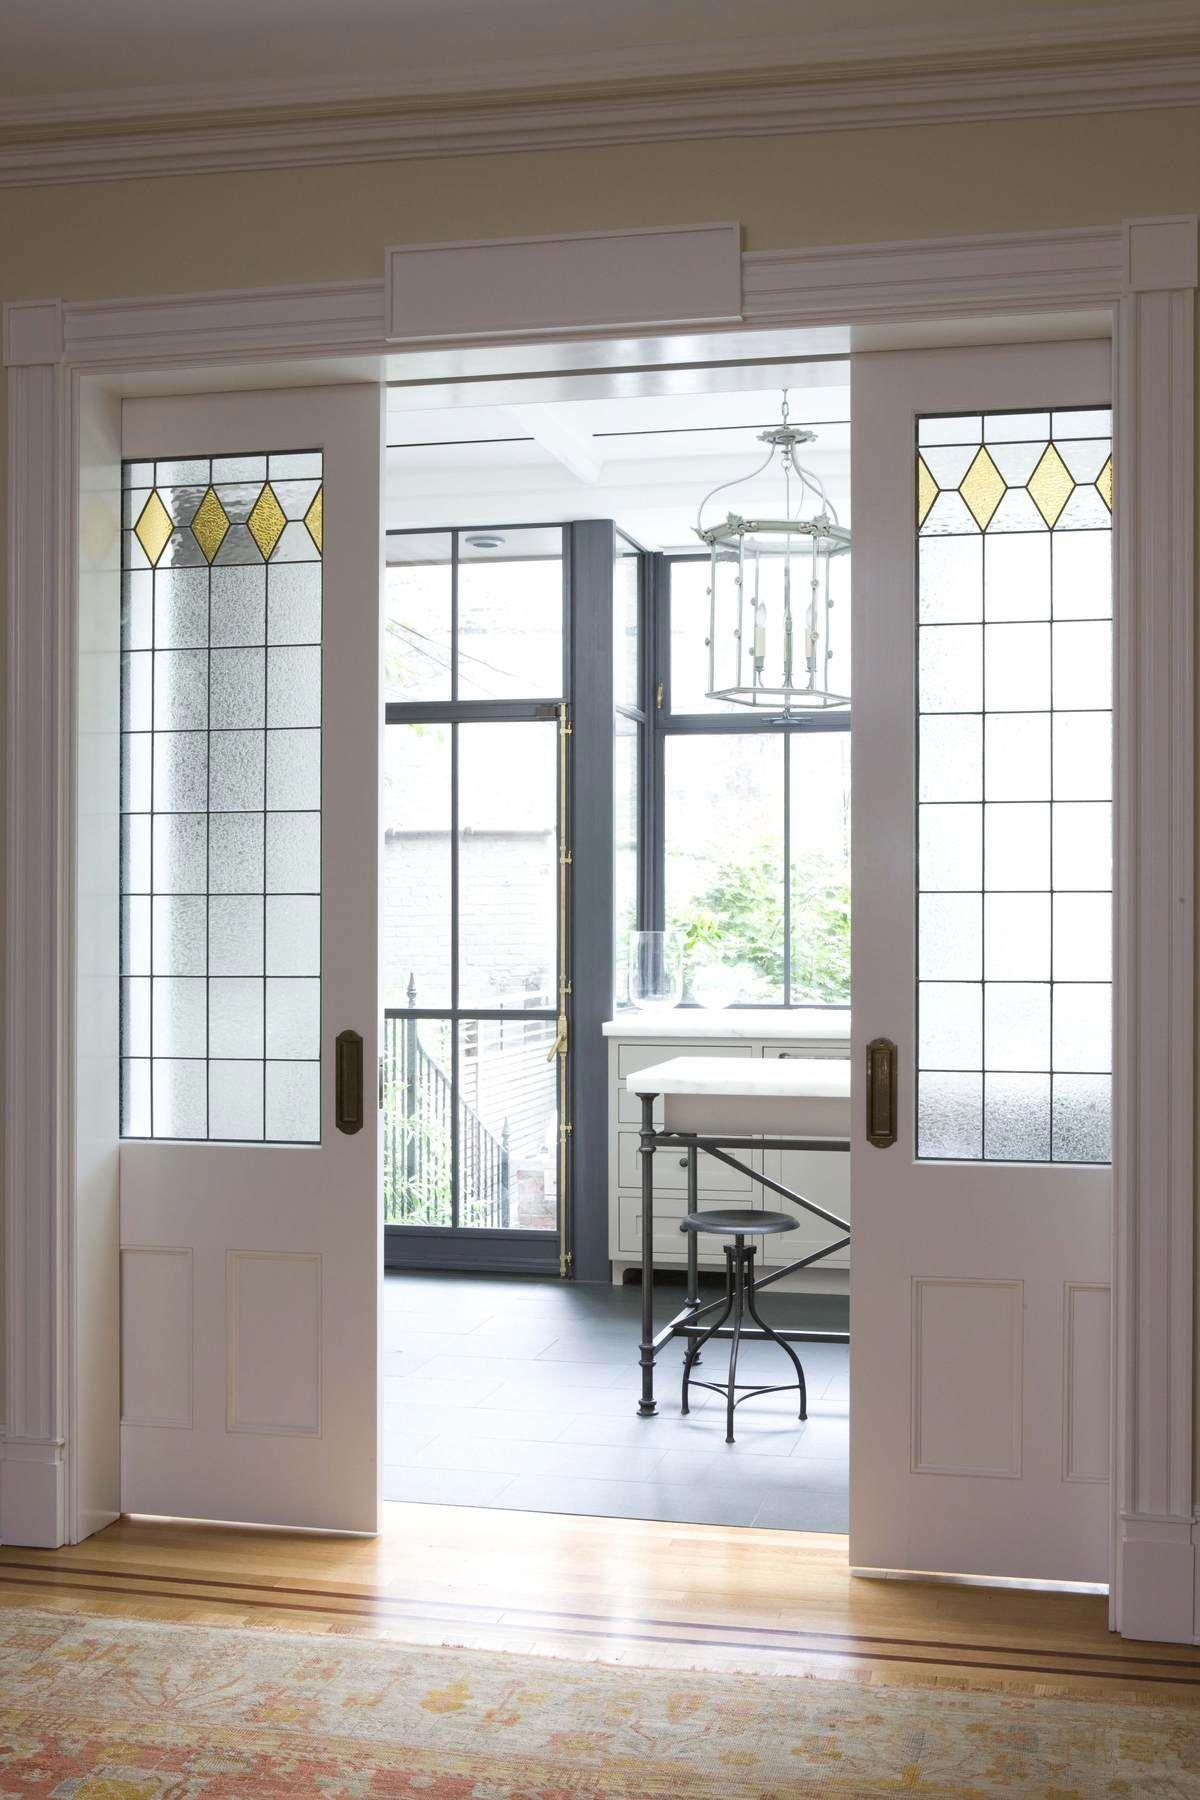 Interior Sliding Barn Doors For Sale Sliding French Doors Indoor Barn Style Doors 20190620 Dom Francuzskie Dveri Interer